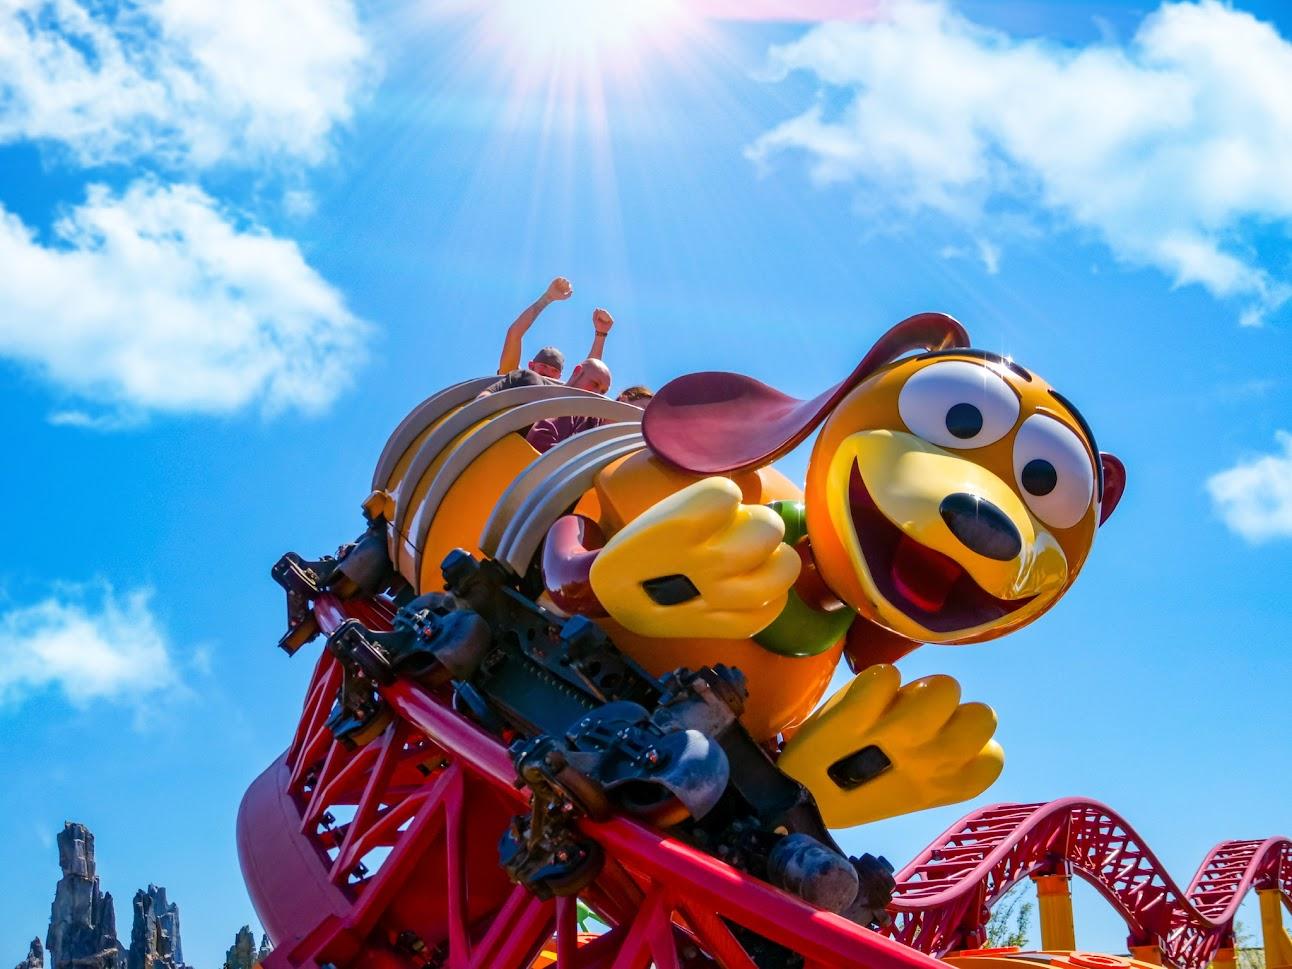 Slinky Dog Dash/Disney's Hollywood Studios - Photo by Laimis Belzinskas